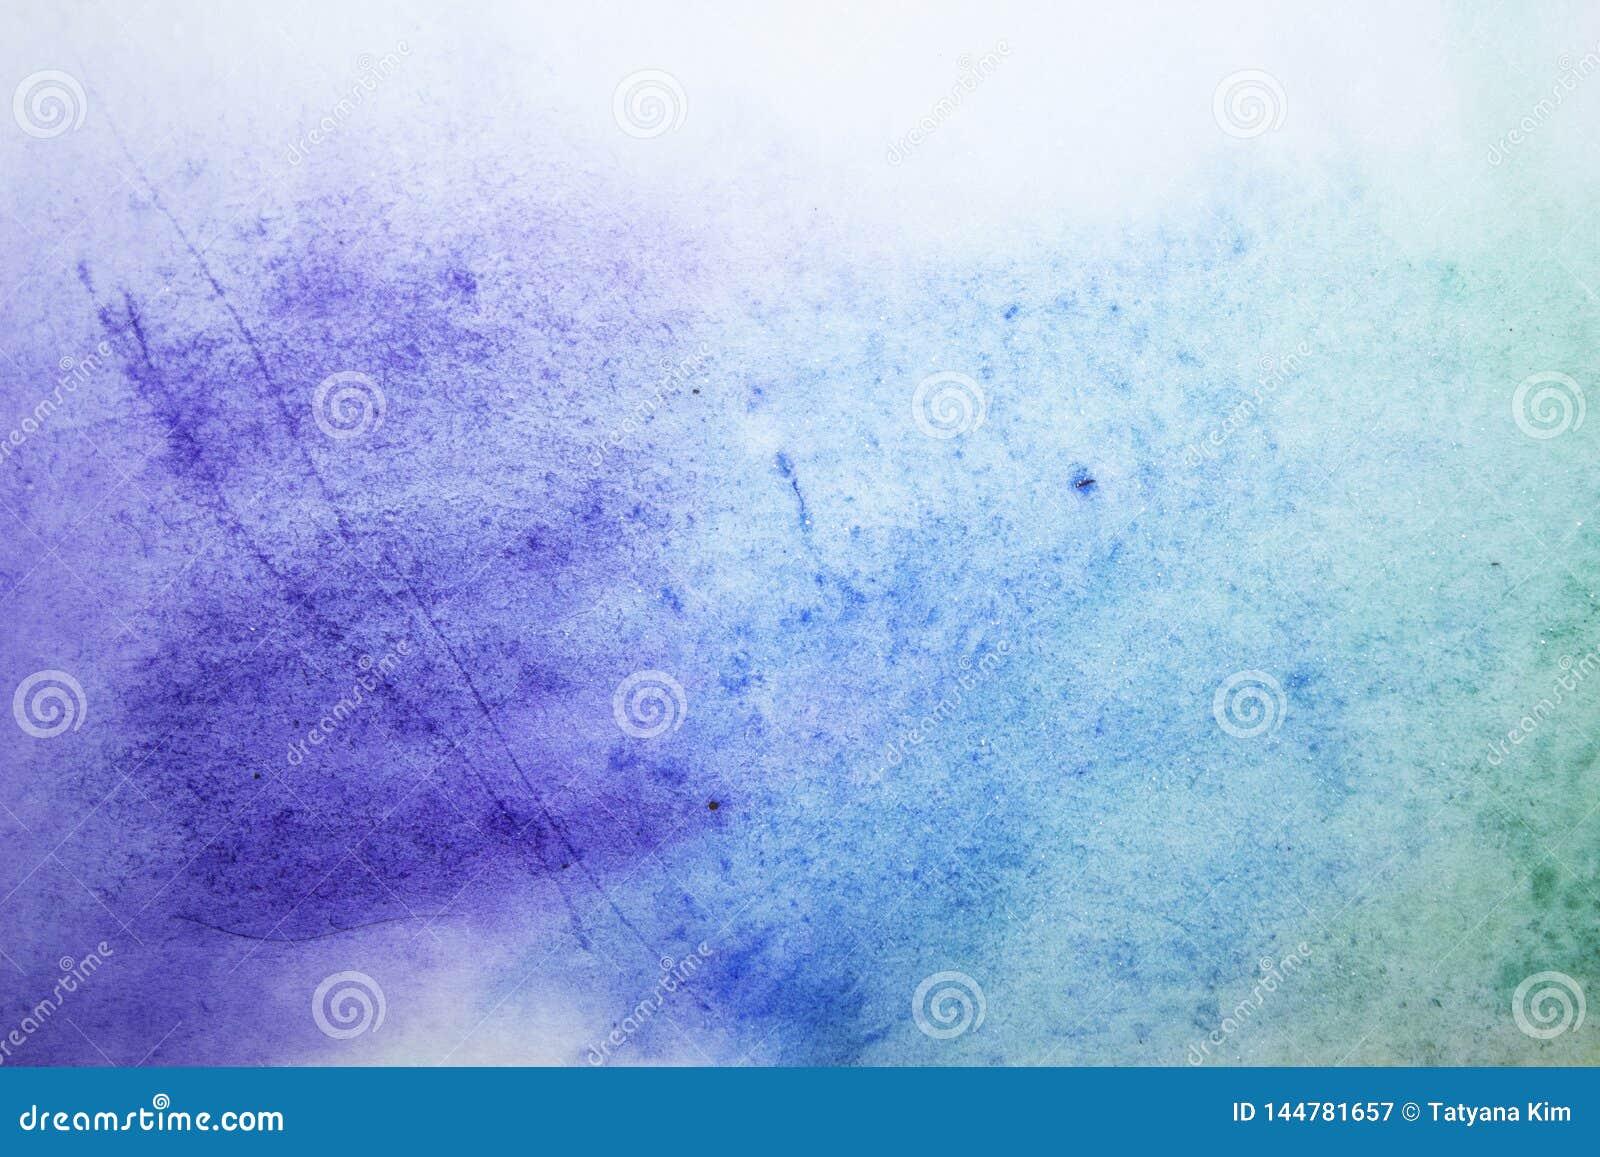 Waterverf achtergrond blauwe verfvlekken op papier